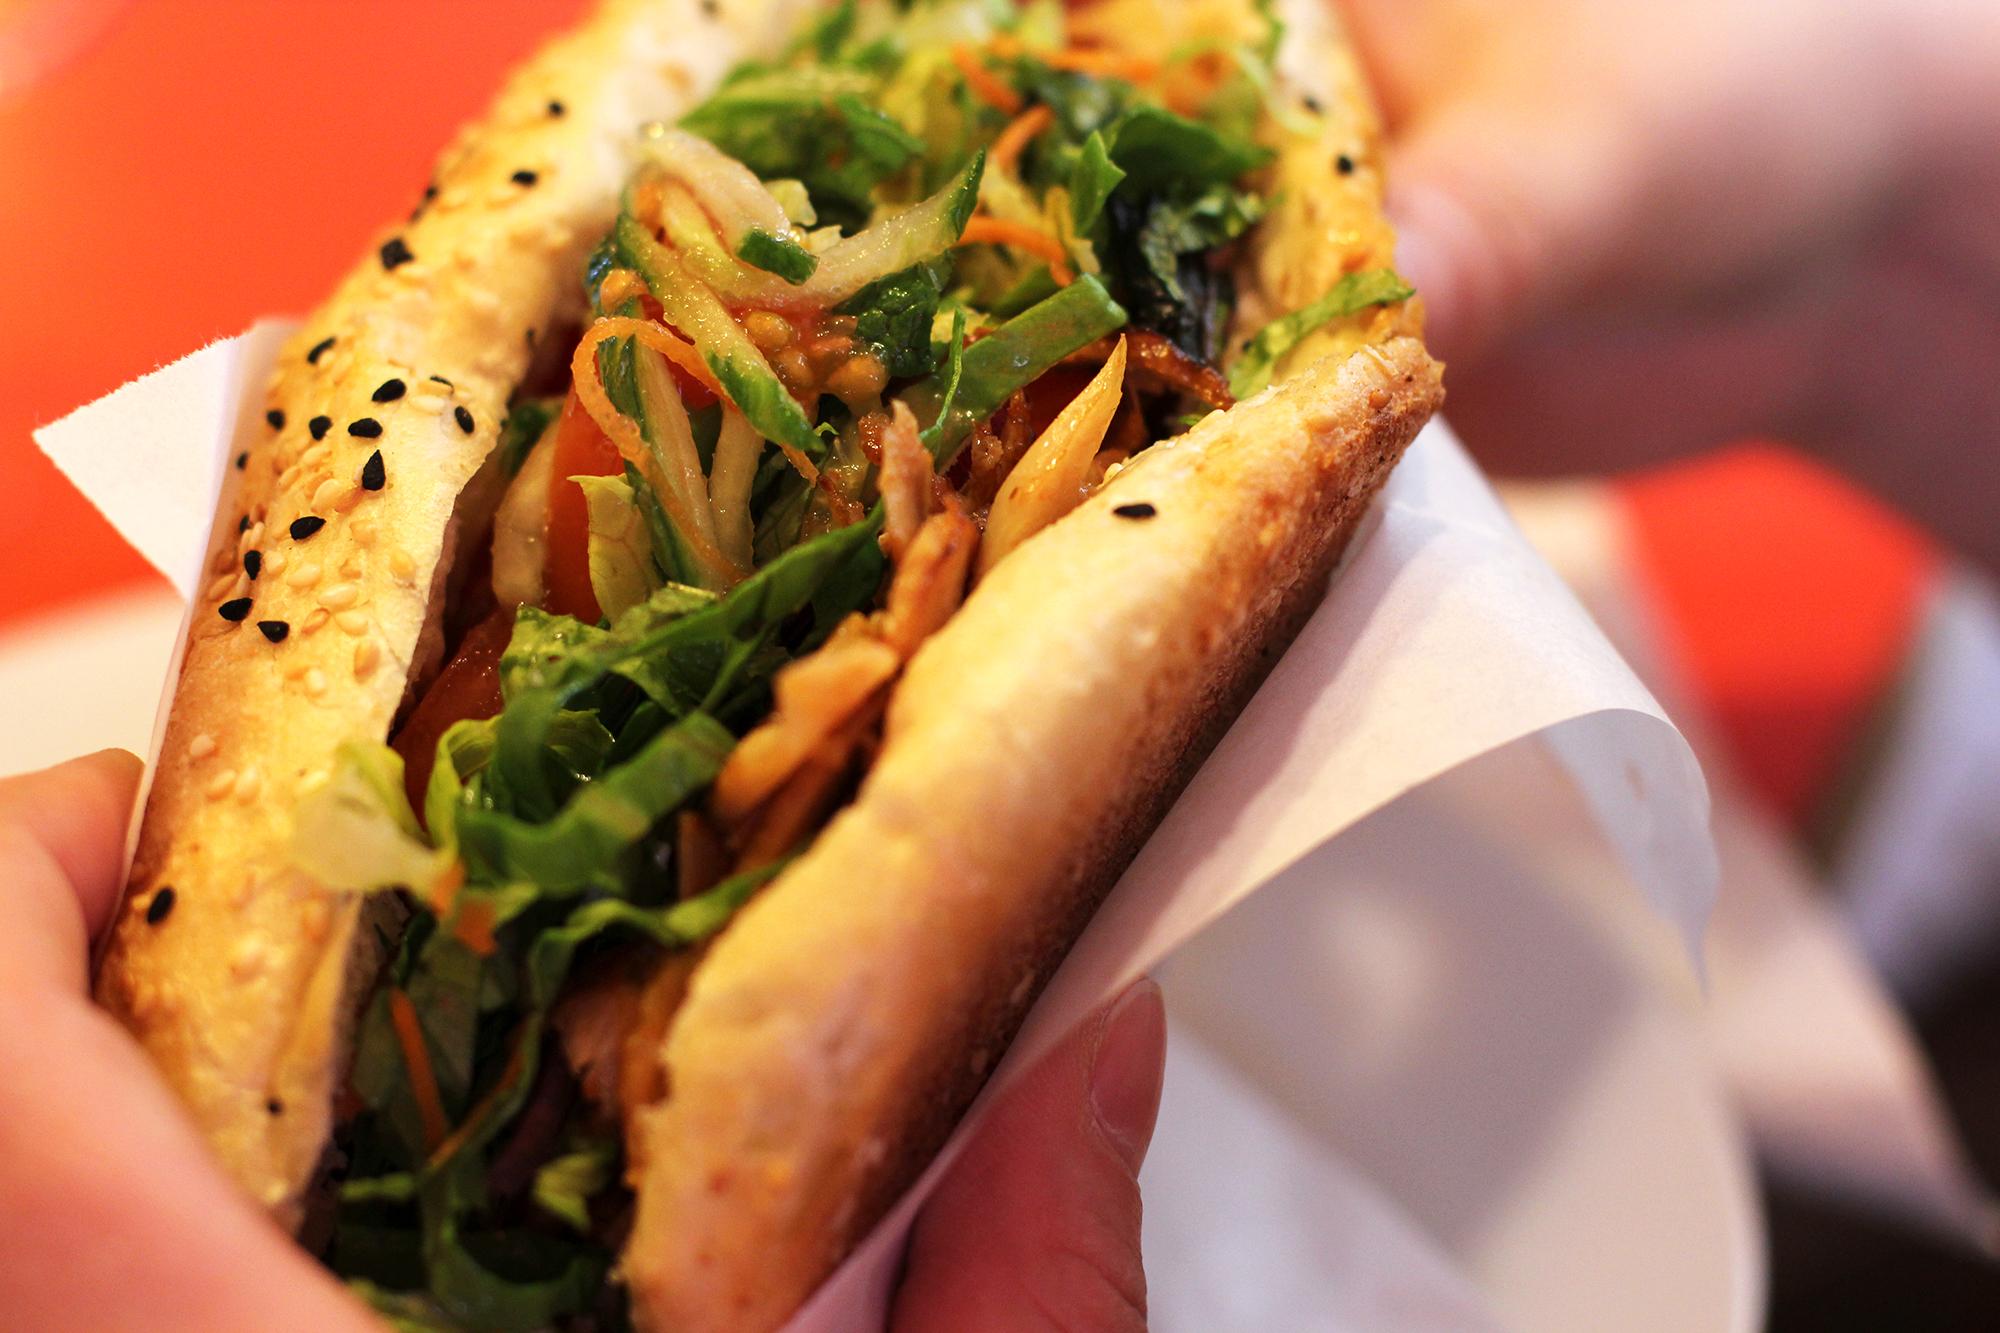 Eating Gemüse Döner im Brot at Rüyam Gemüse Kebab Berlin